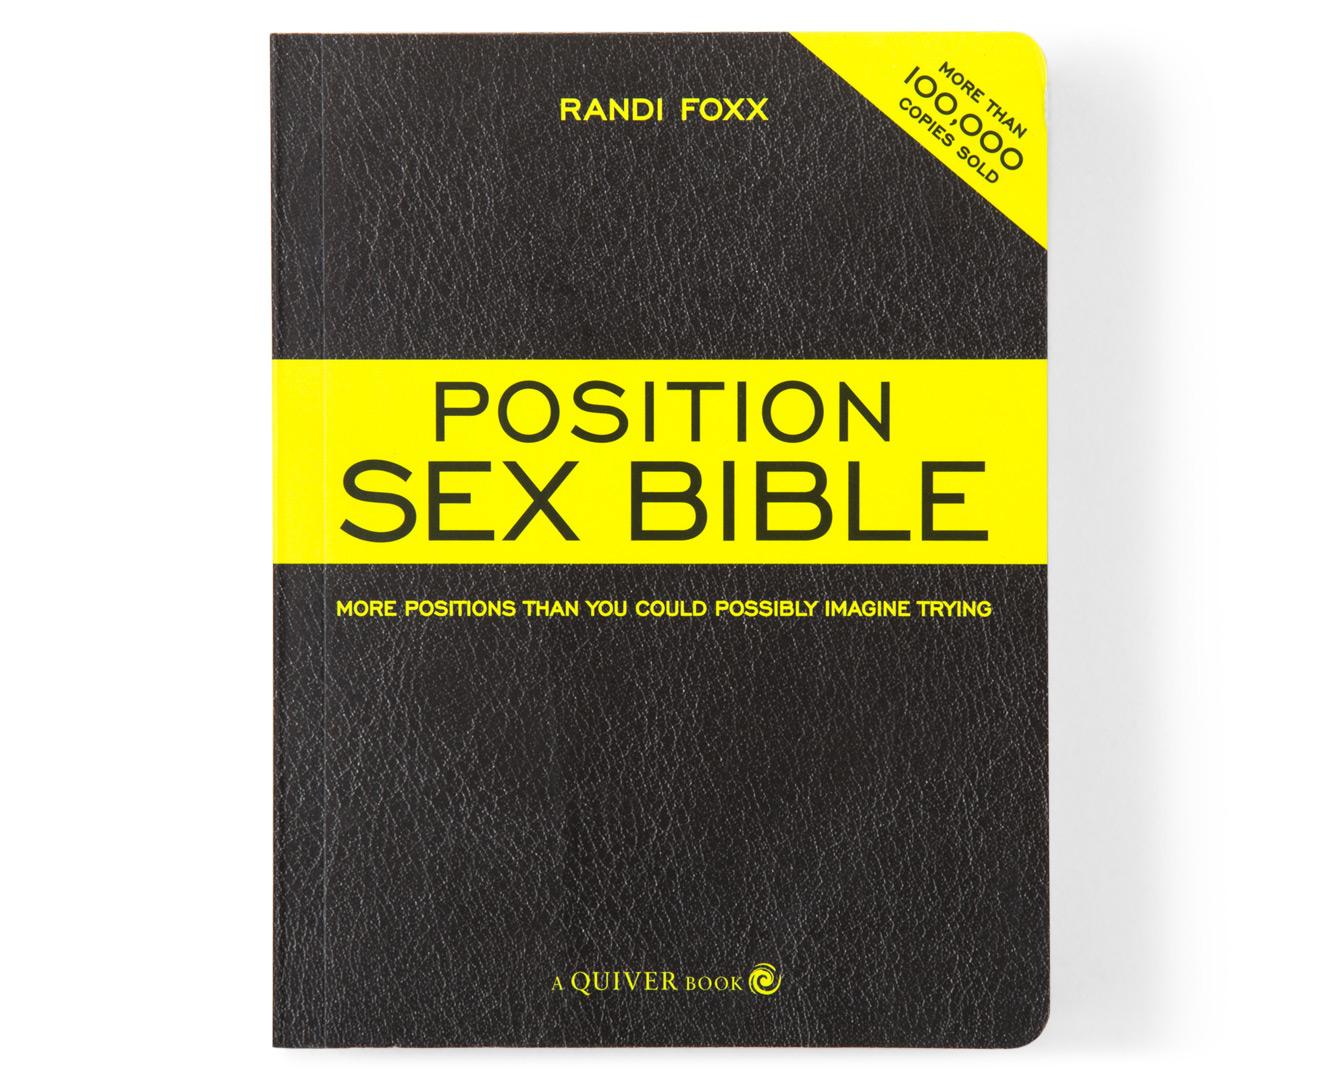 the position sex bible reviews